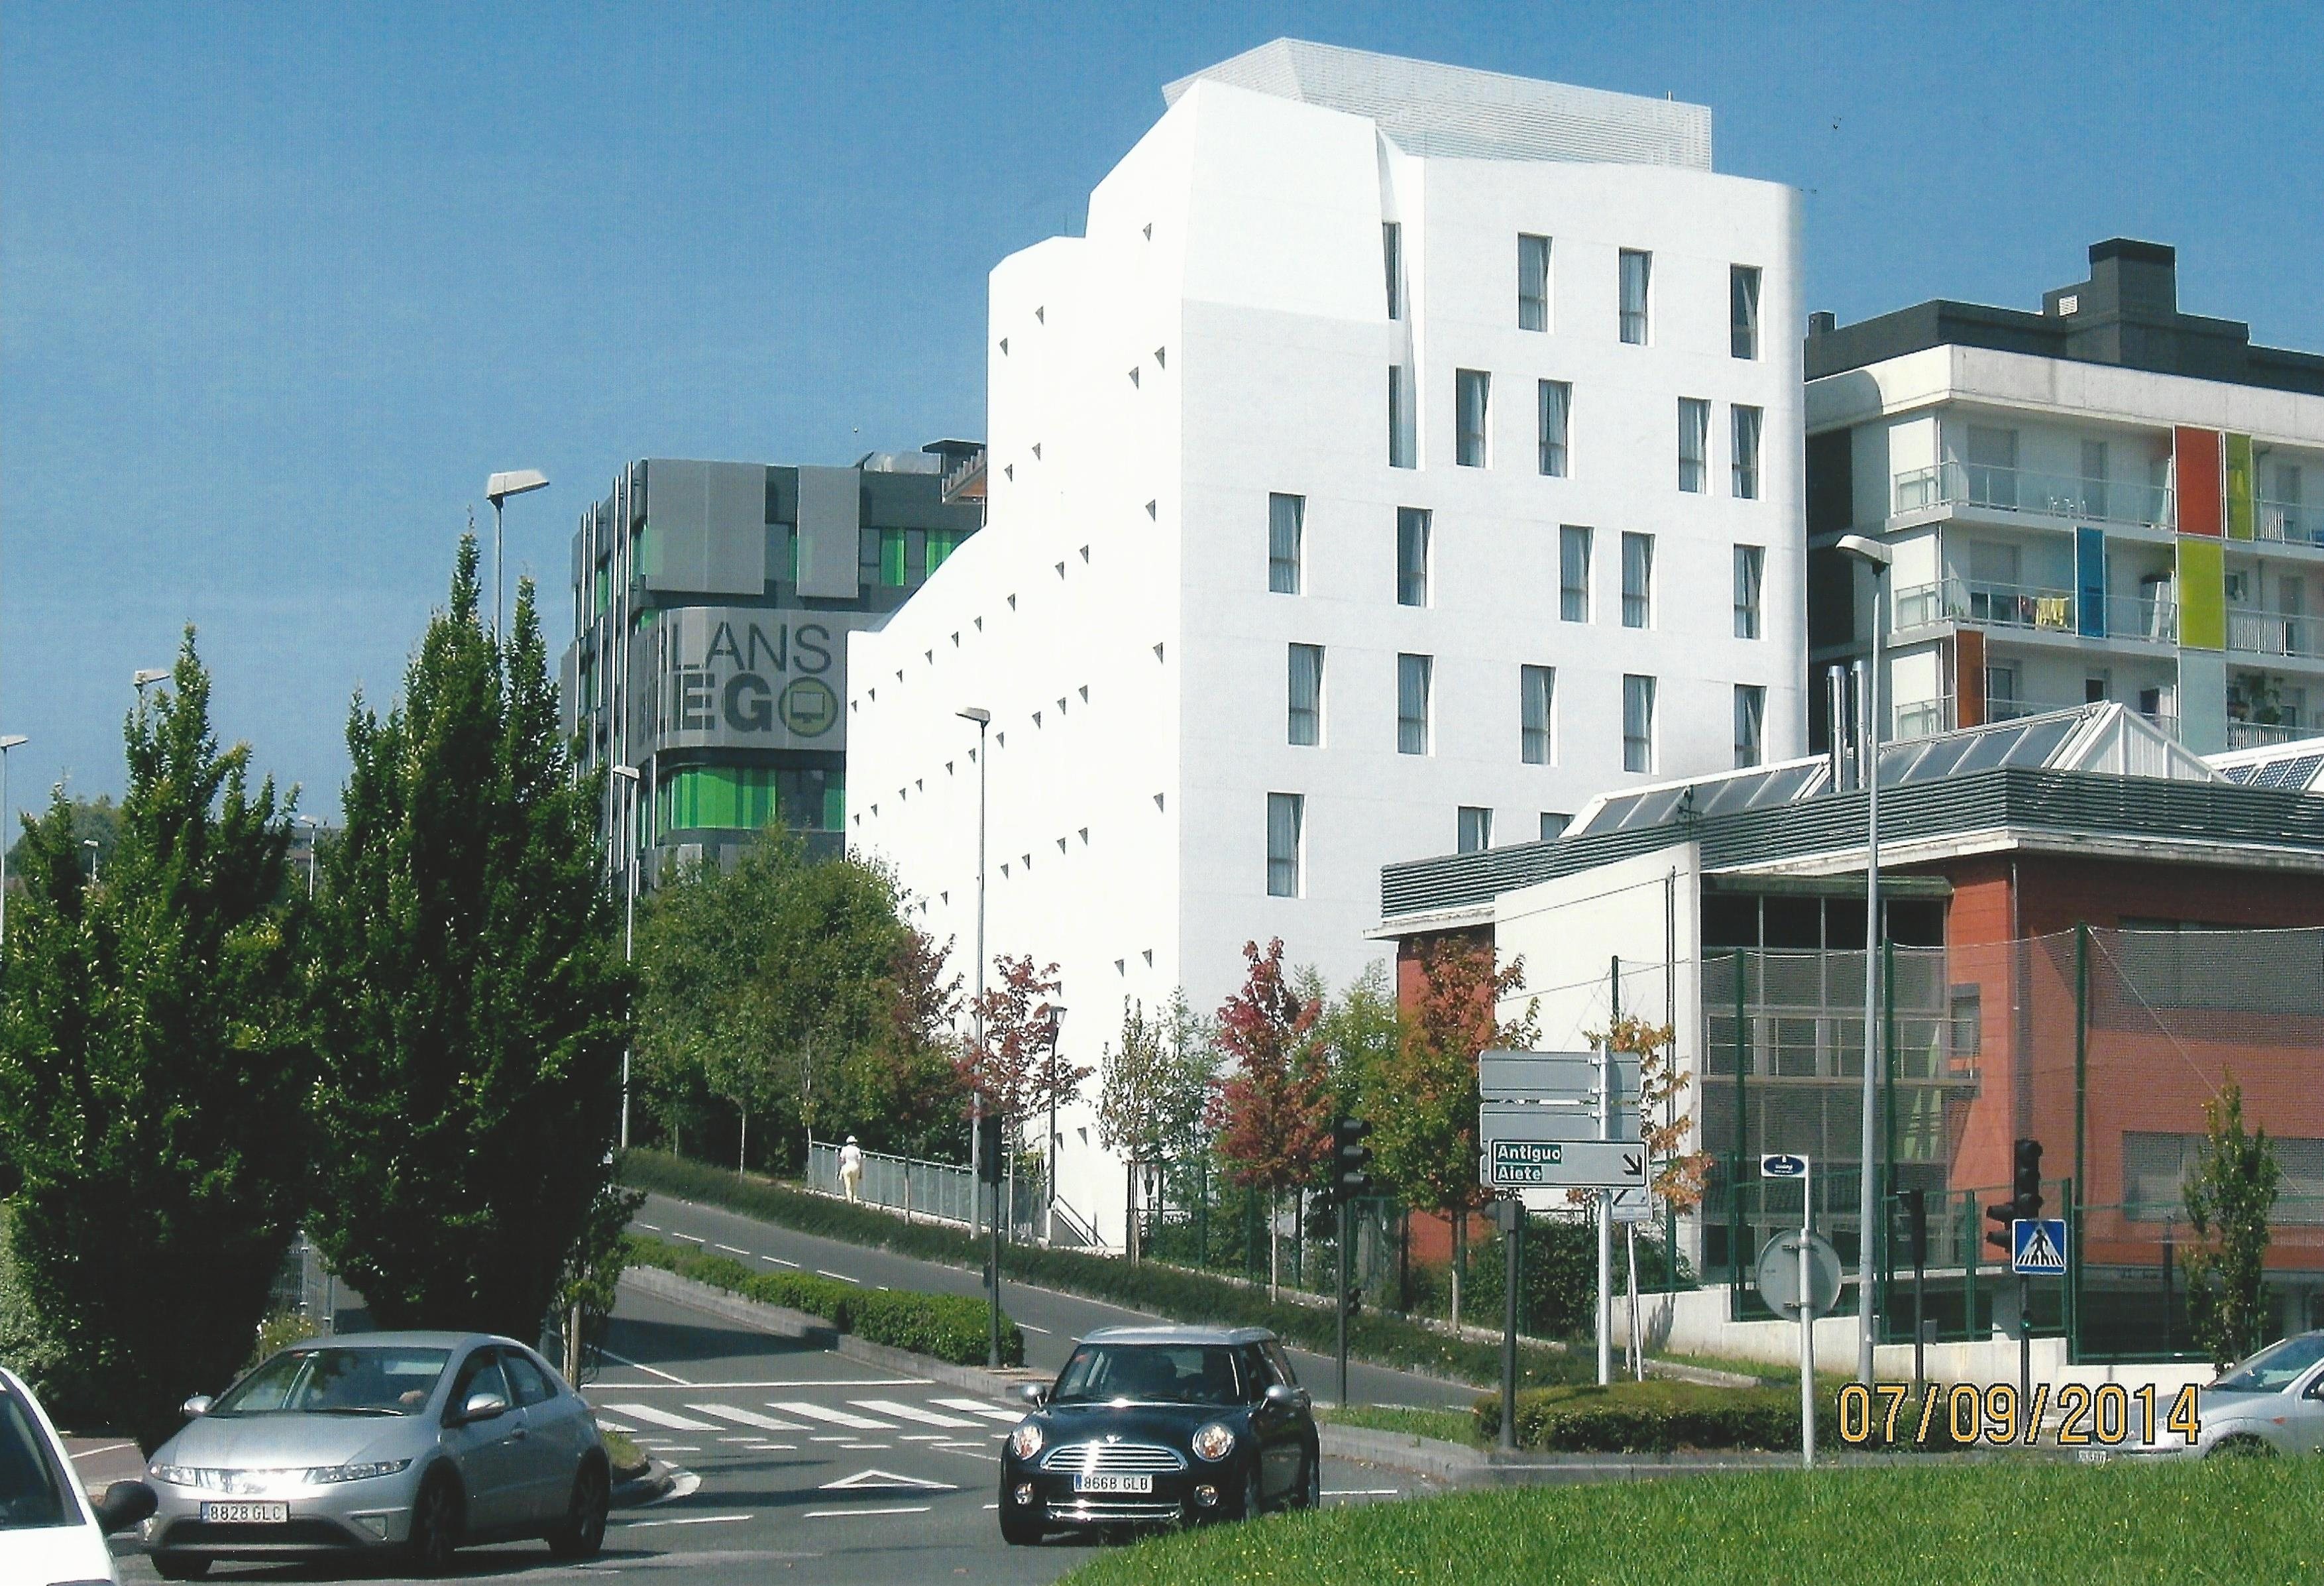 File:Zenit San Sebastian hotela - Hotel Zenit San Sebastian  (23320678365).jpg - Wikimedia Commons